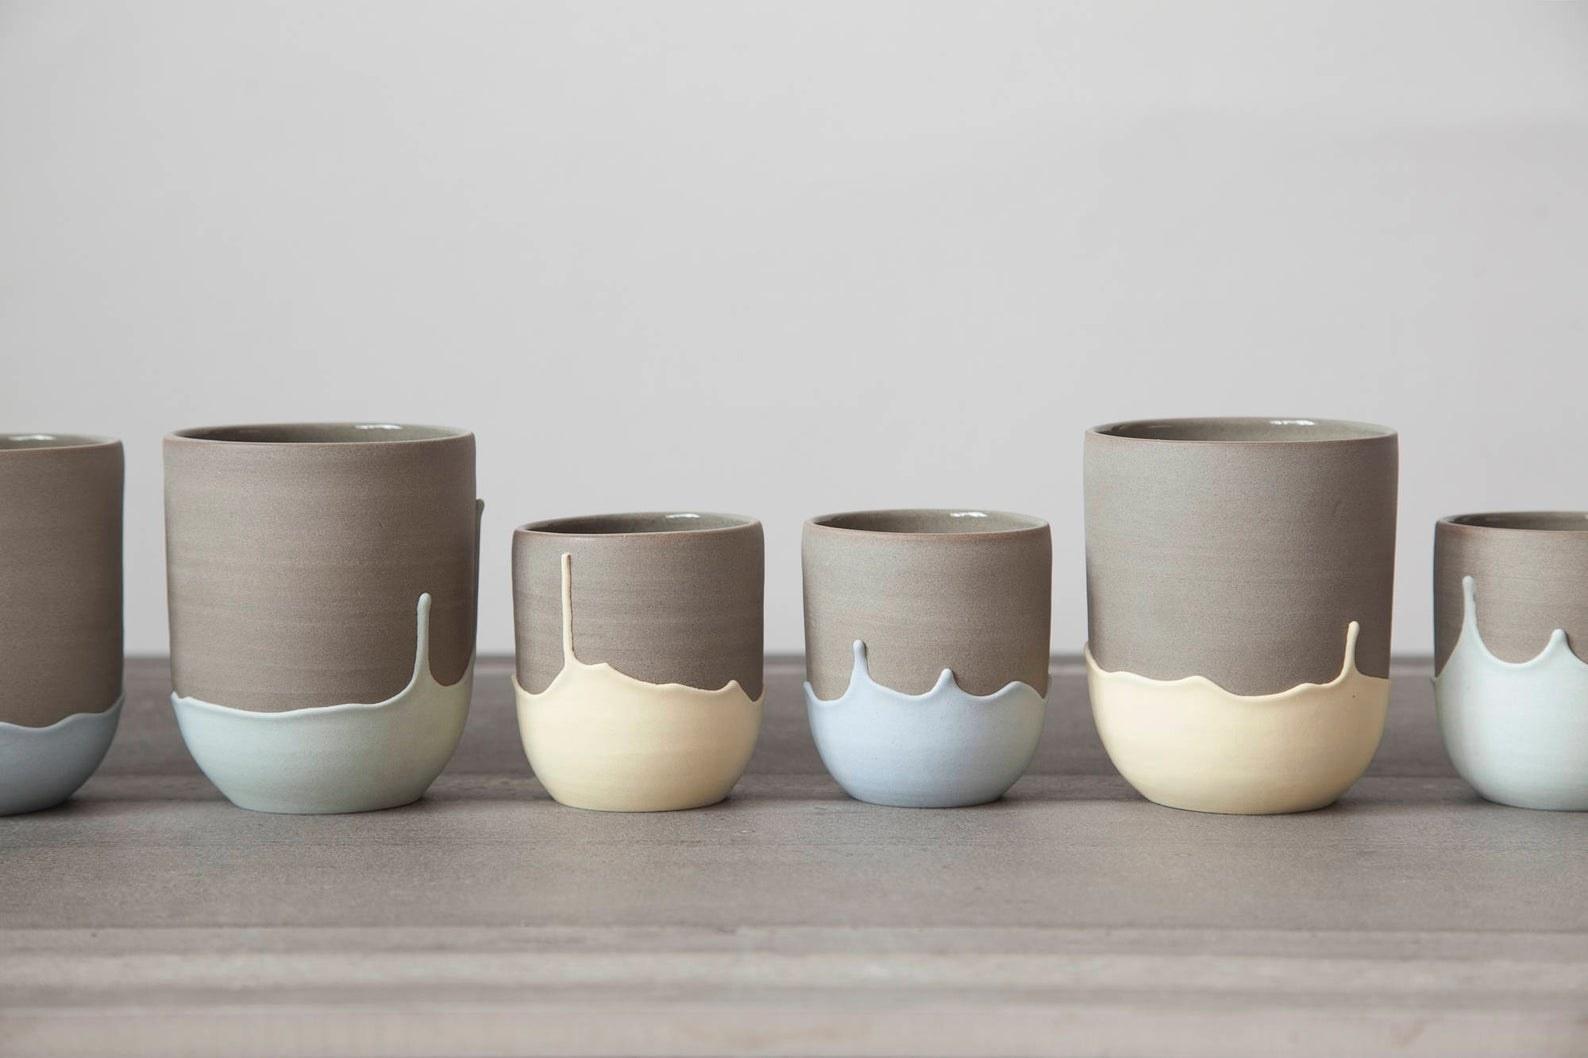 row of six mugs with upside down drip pattern